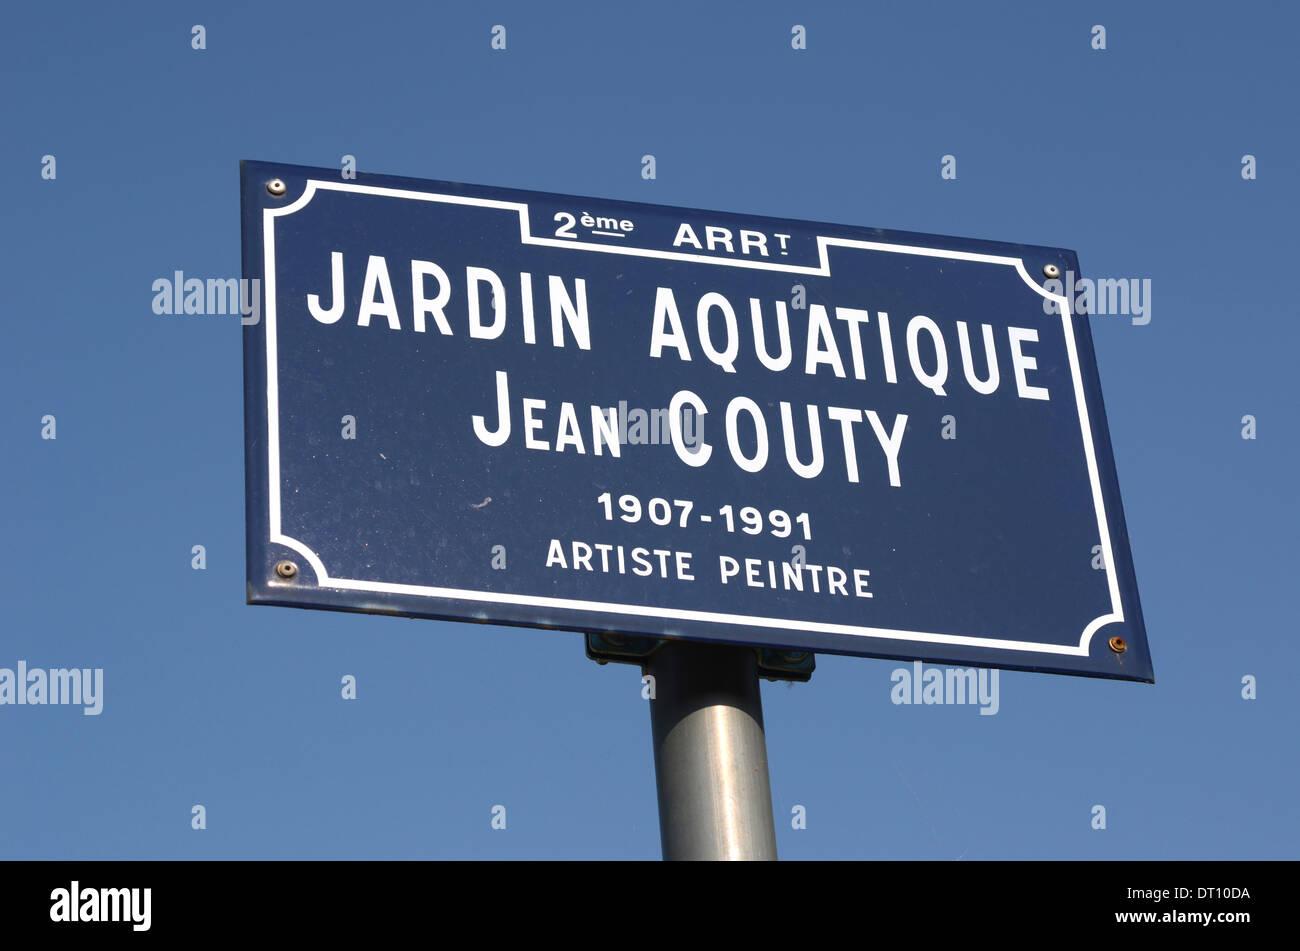 Blue street sign for Jardin aquatique Jean Couty,showing name of Jean Couty, artiste, peintre, La Confluence area, Lyon, France - Stock Image